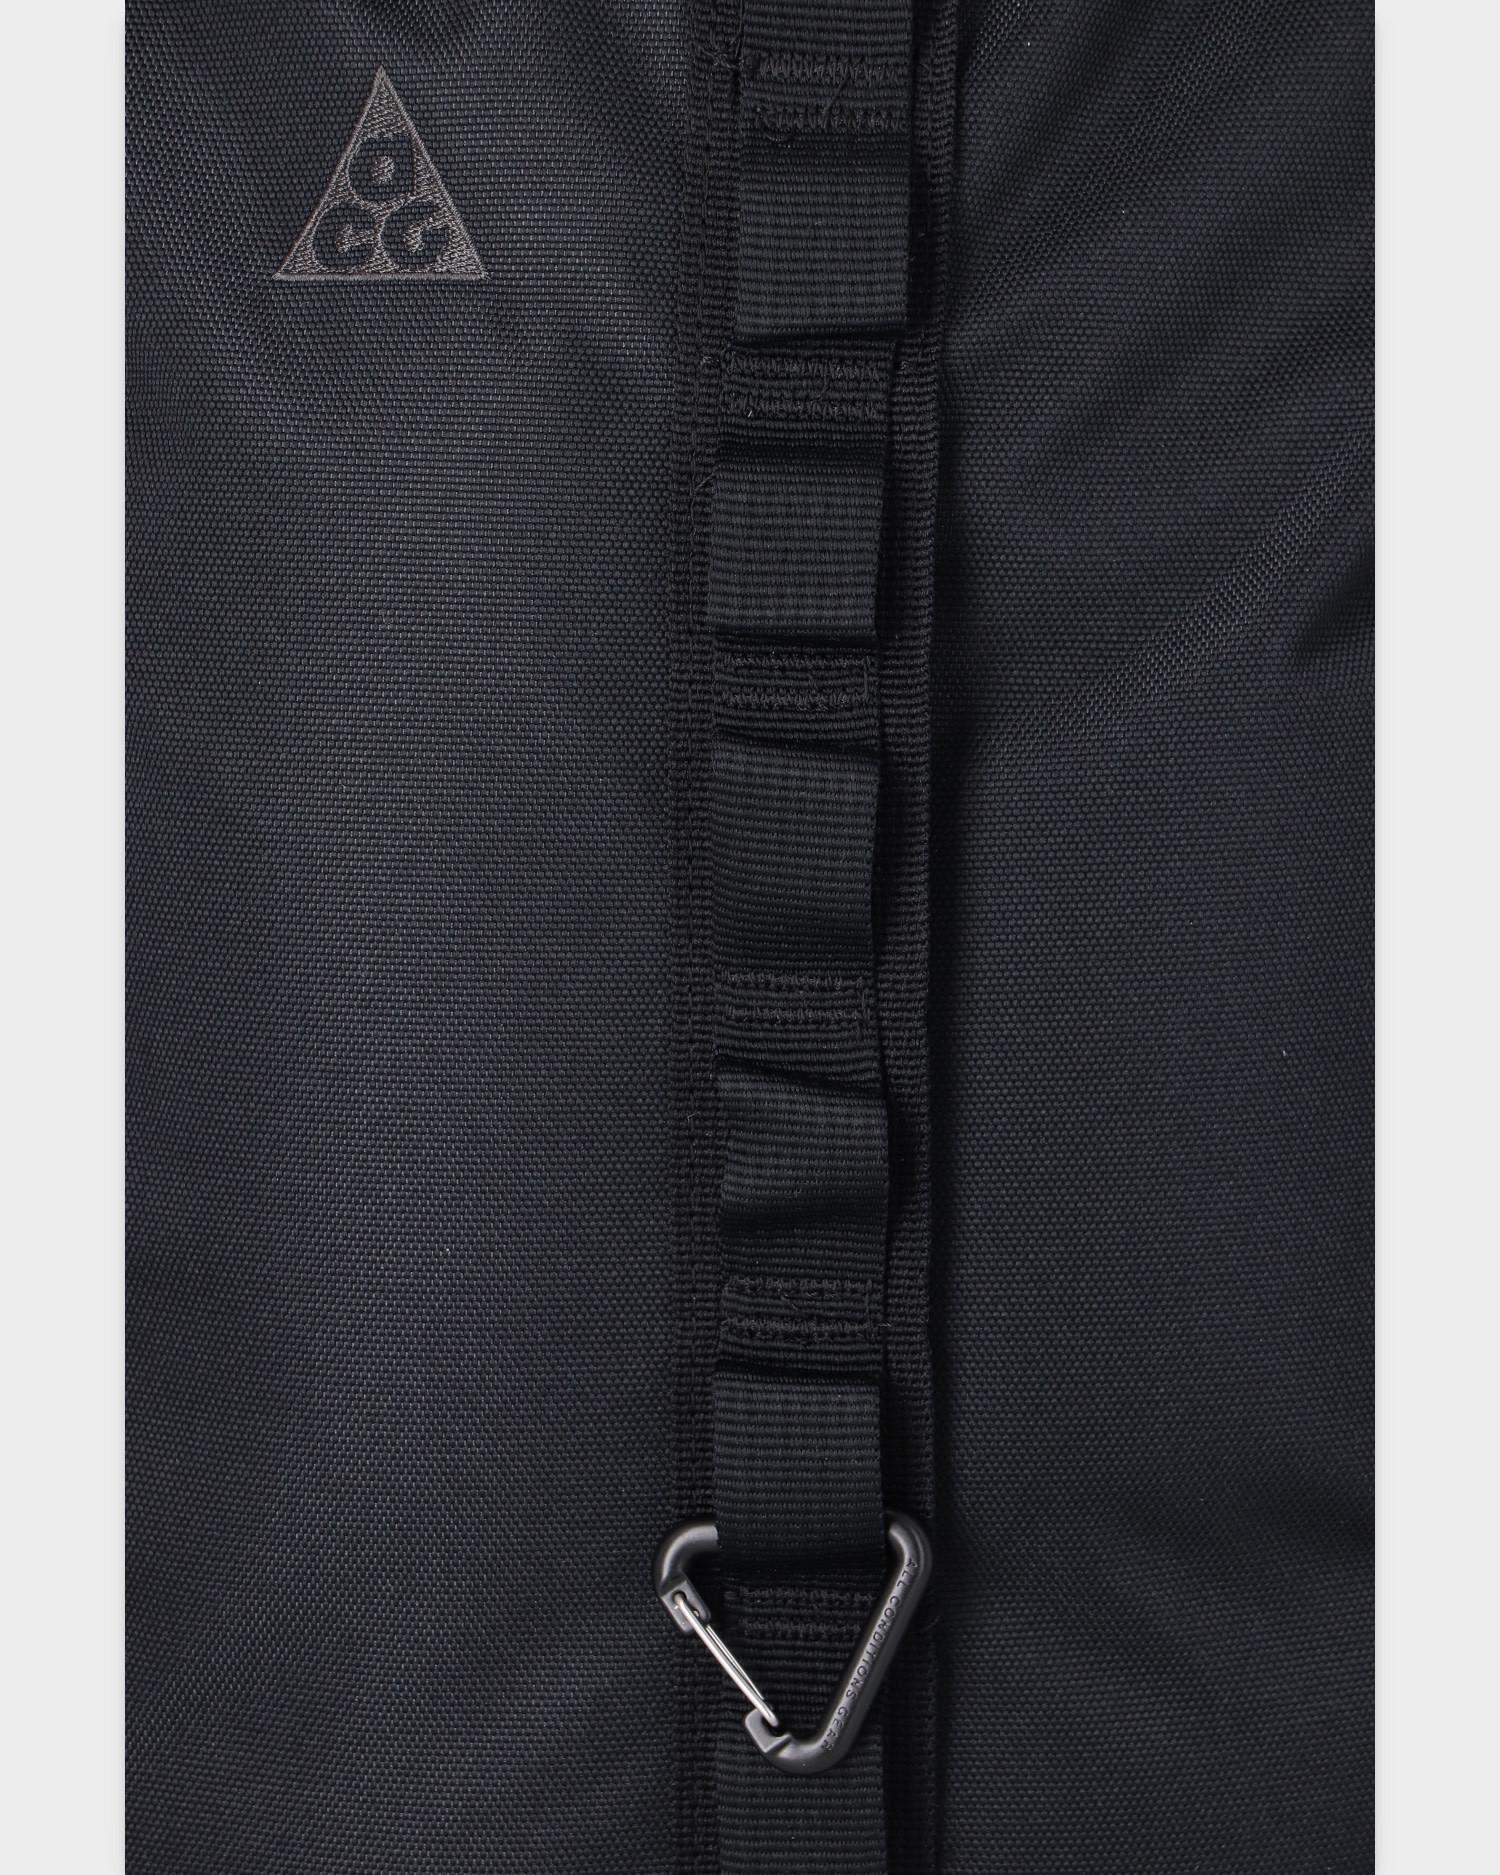 Nike ACG Karst Bag Black/Black